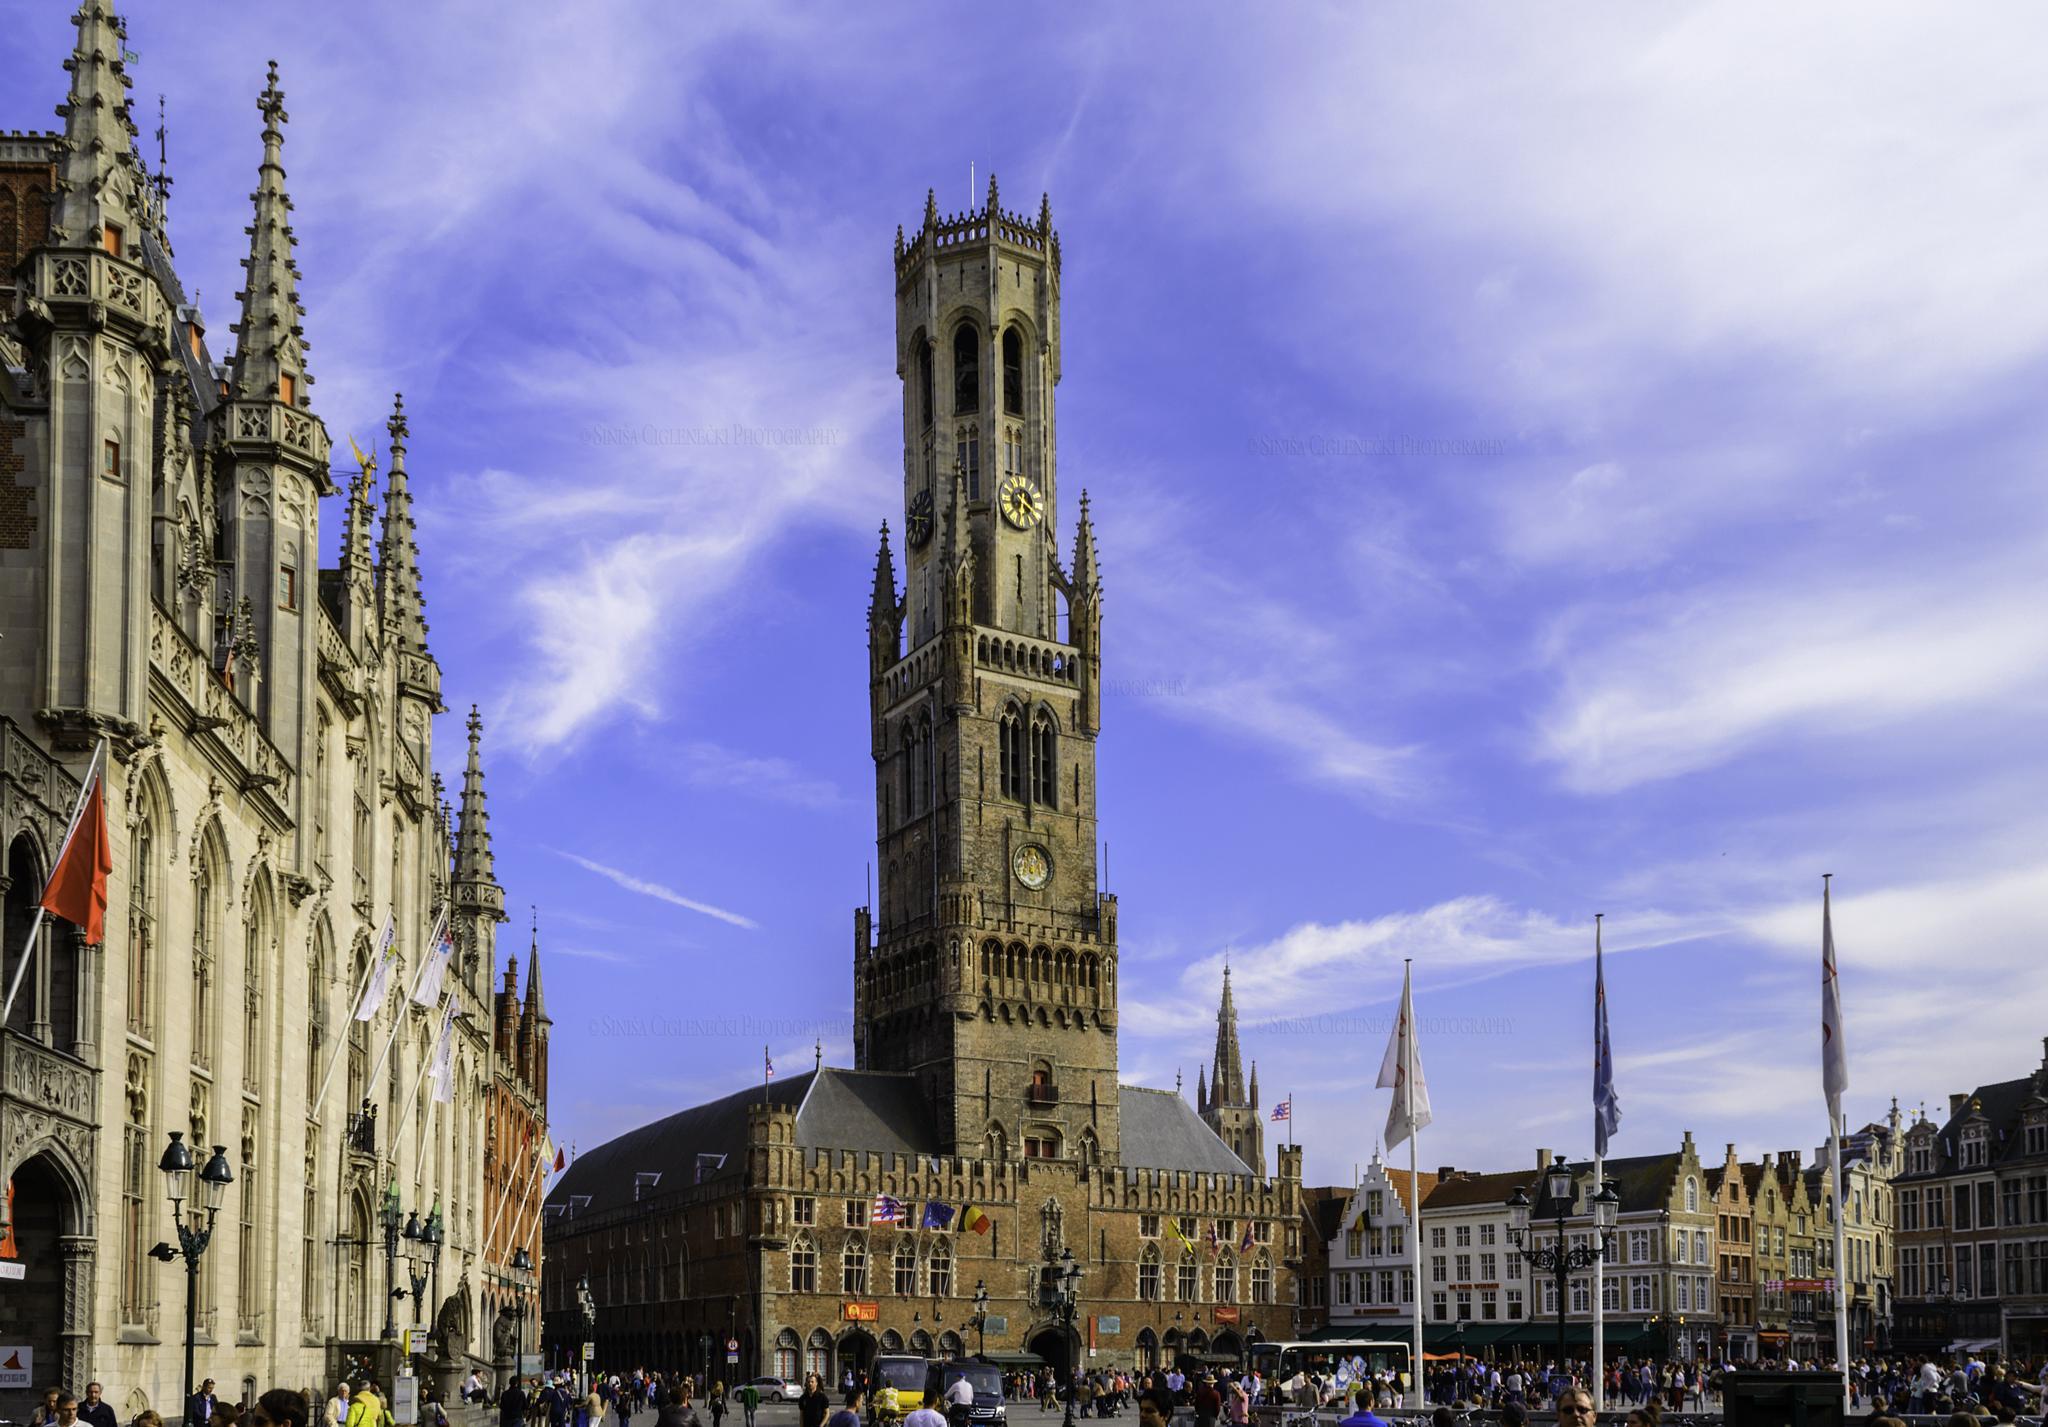 Belfry of Bruges (Brugge), Belgium by Siniša Ciglenečki